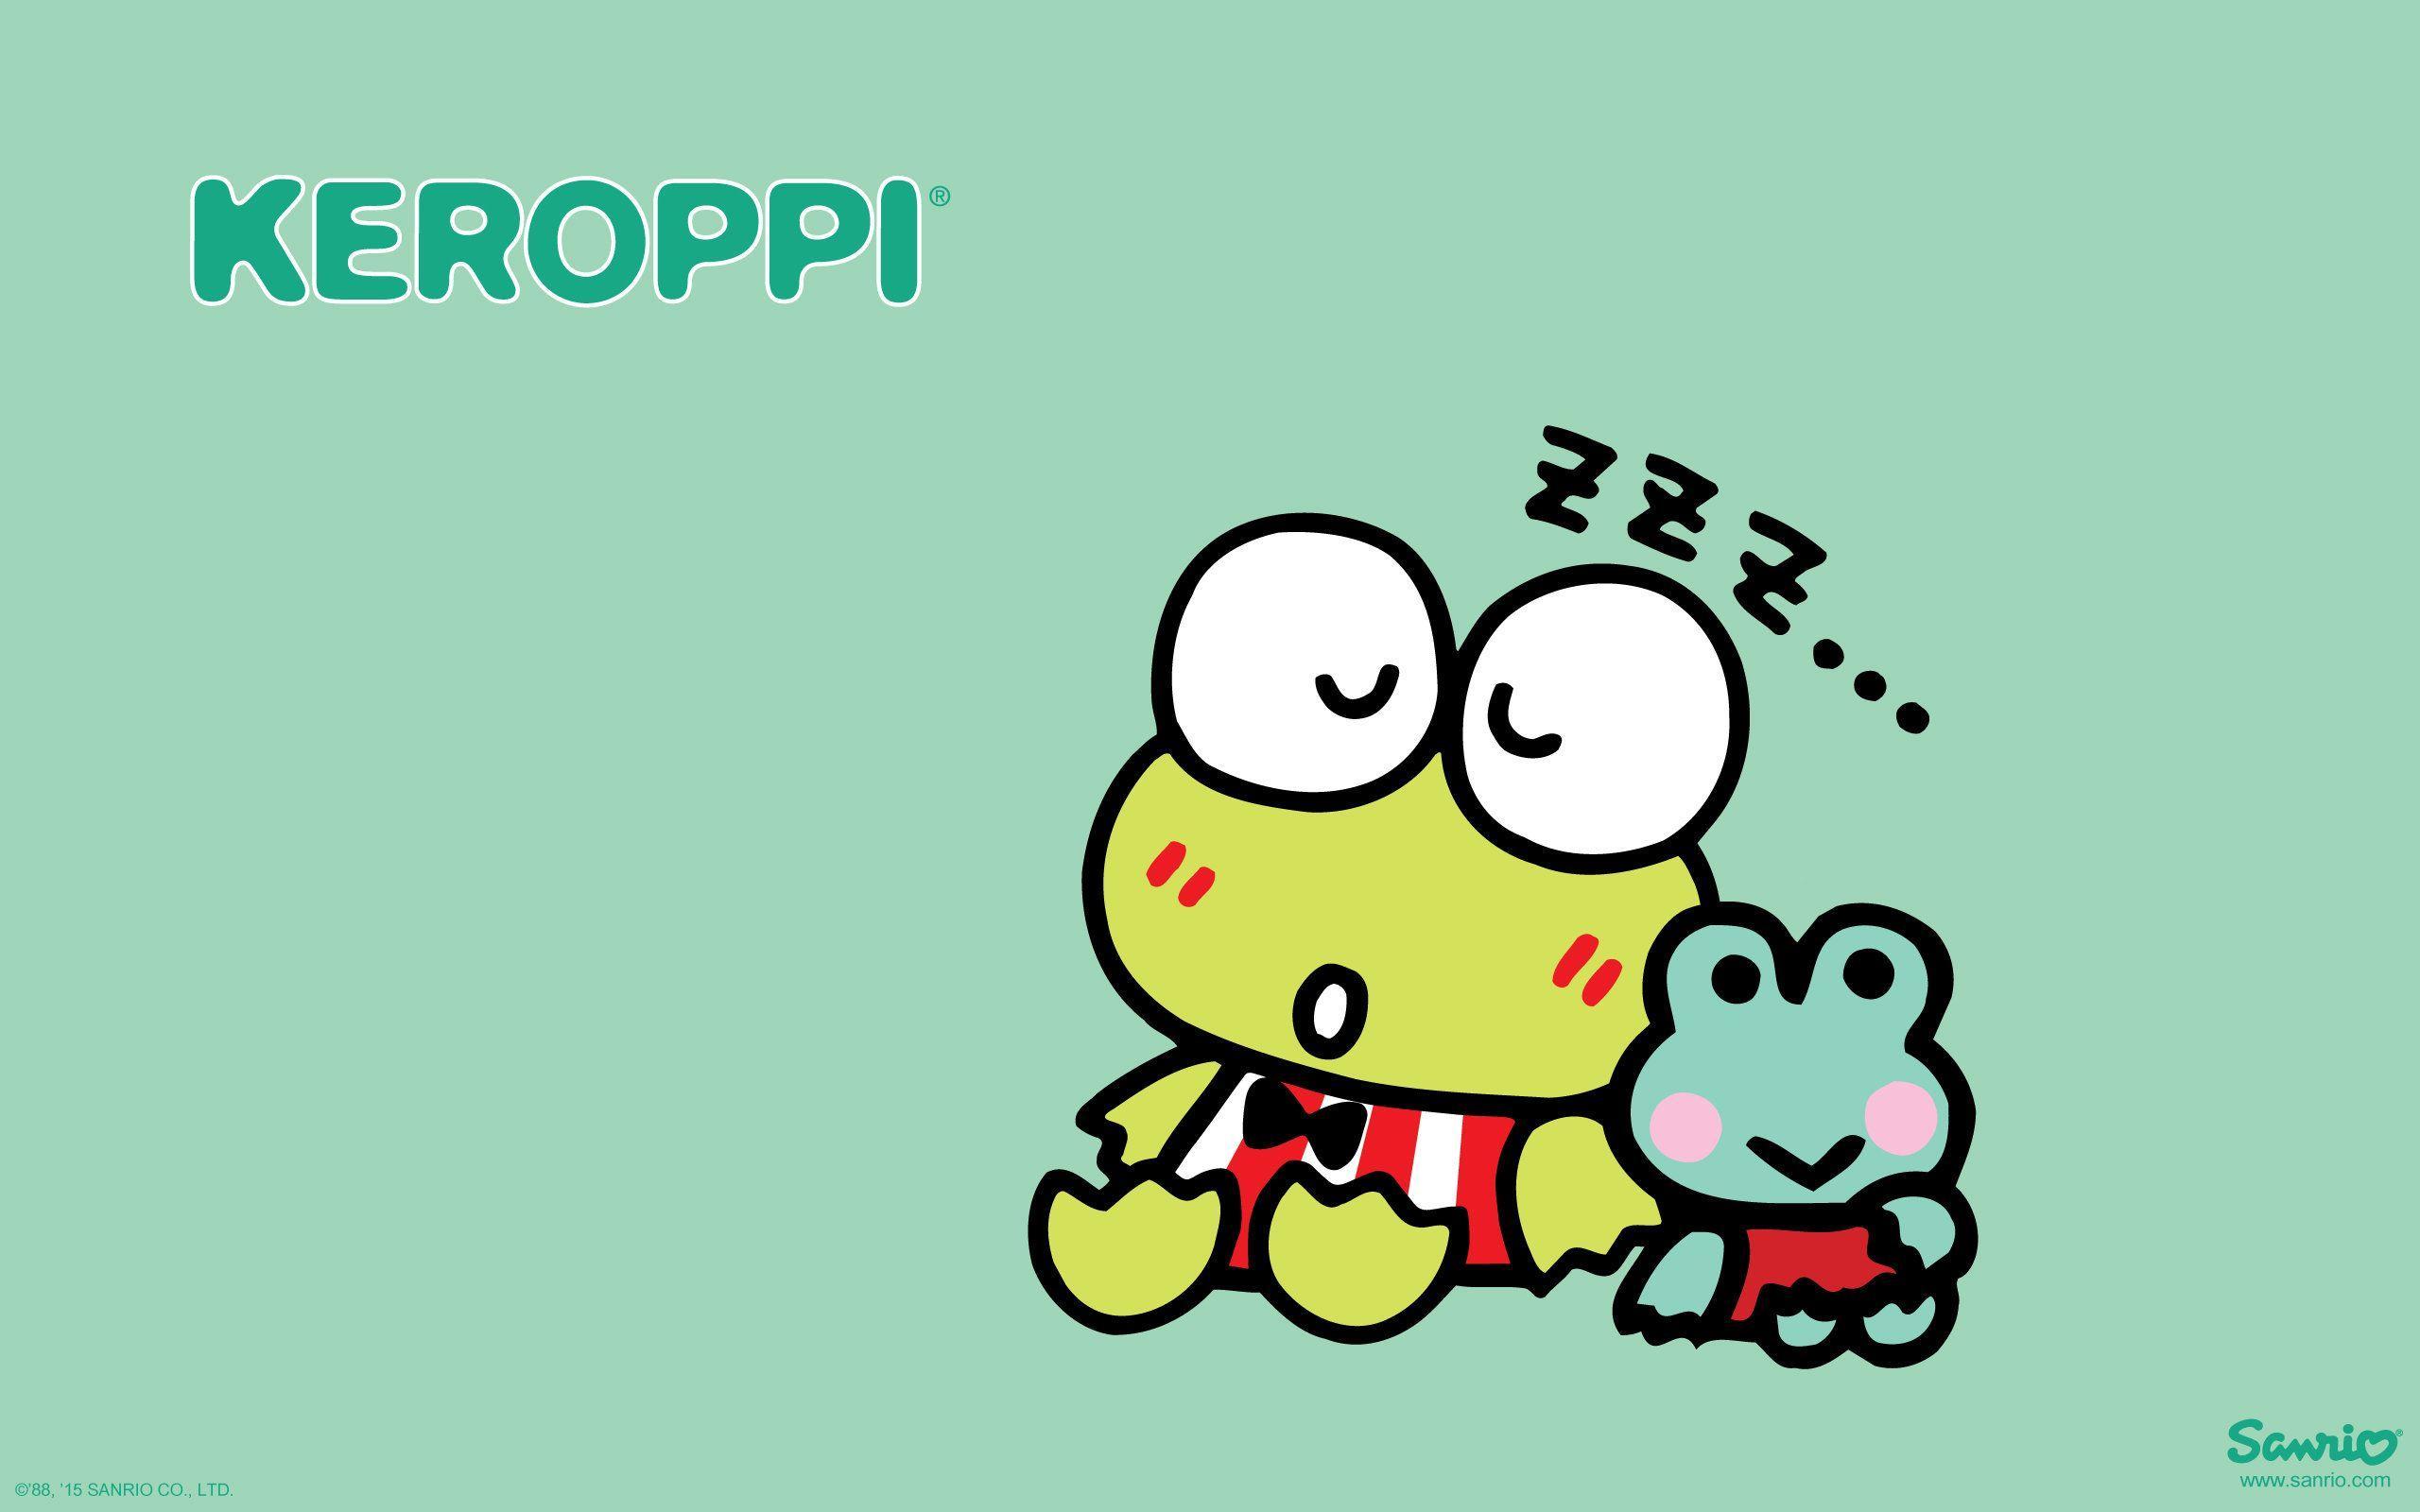 Keroppi Wallpapers Top Free Keroppi Backgrounds